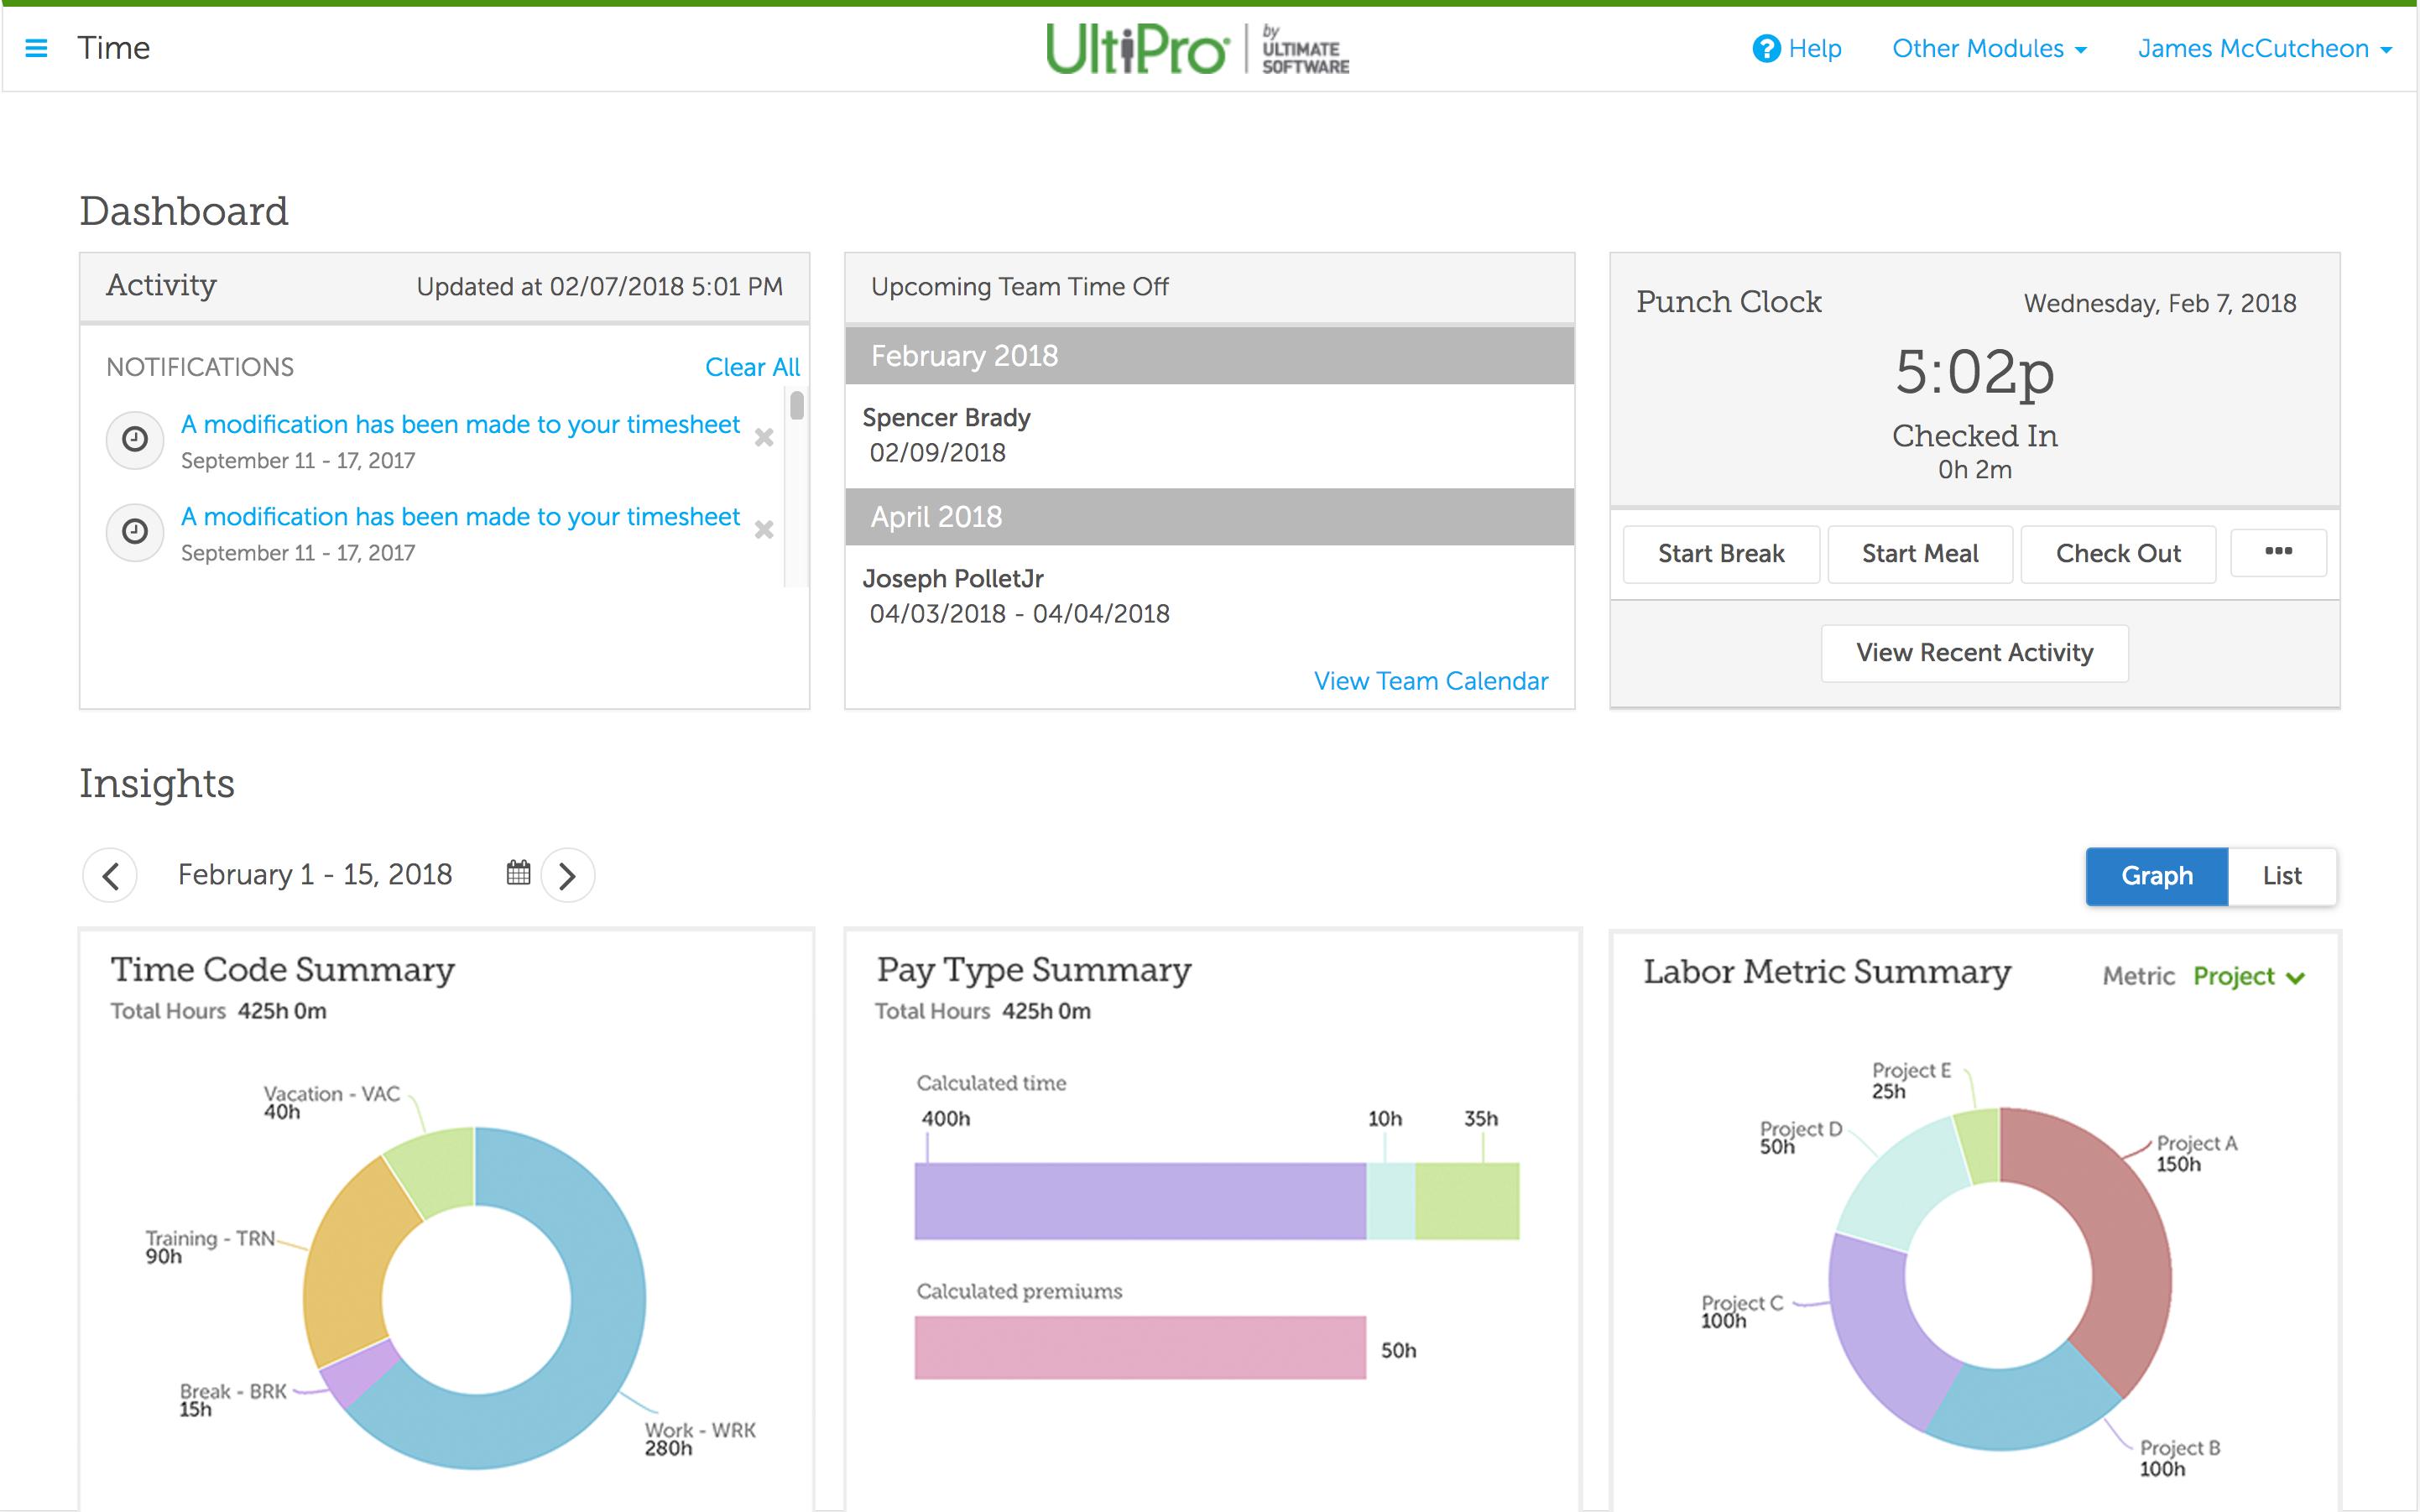 UltiPro Business Intelligence